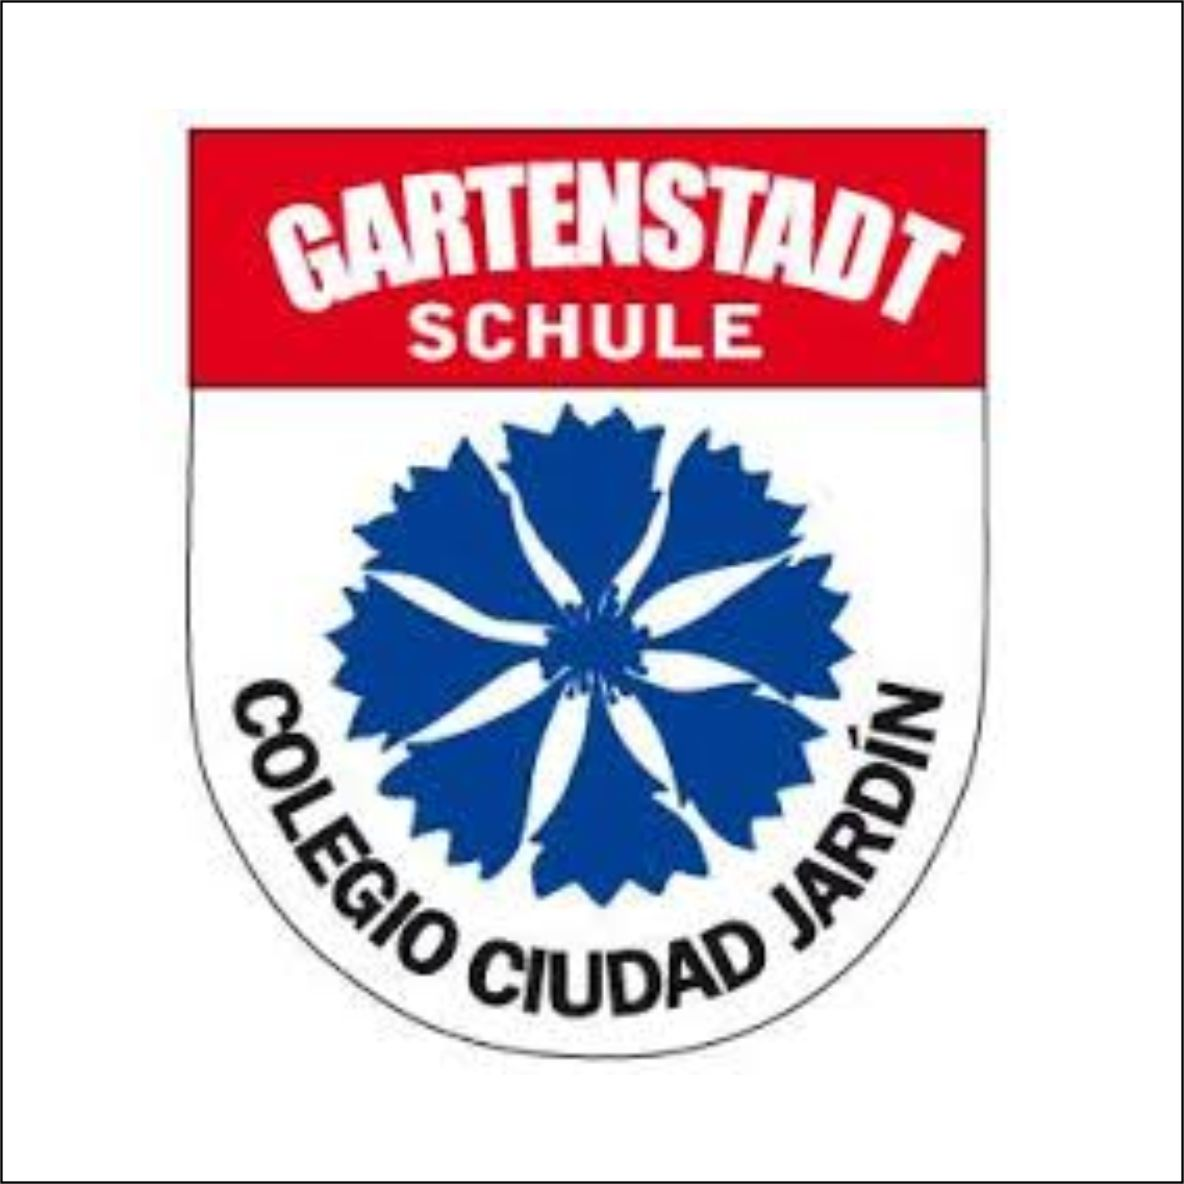 COLEGIO CIUDAD JARDIN GARTENSTADT SCHULE